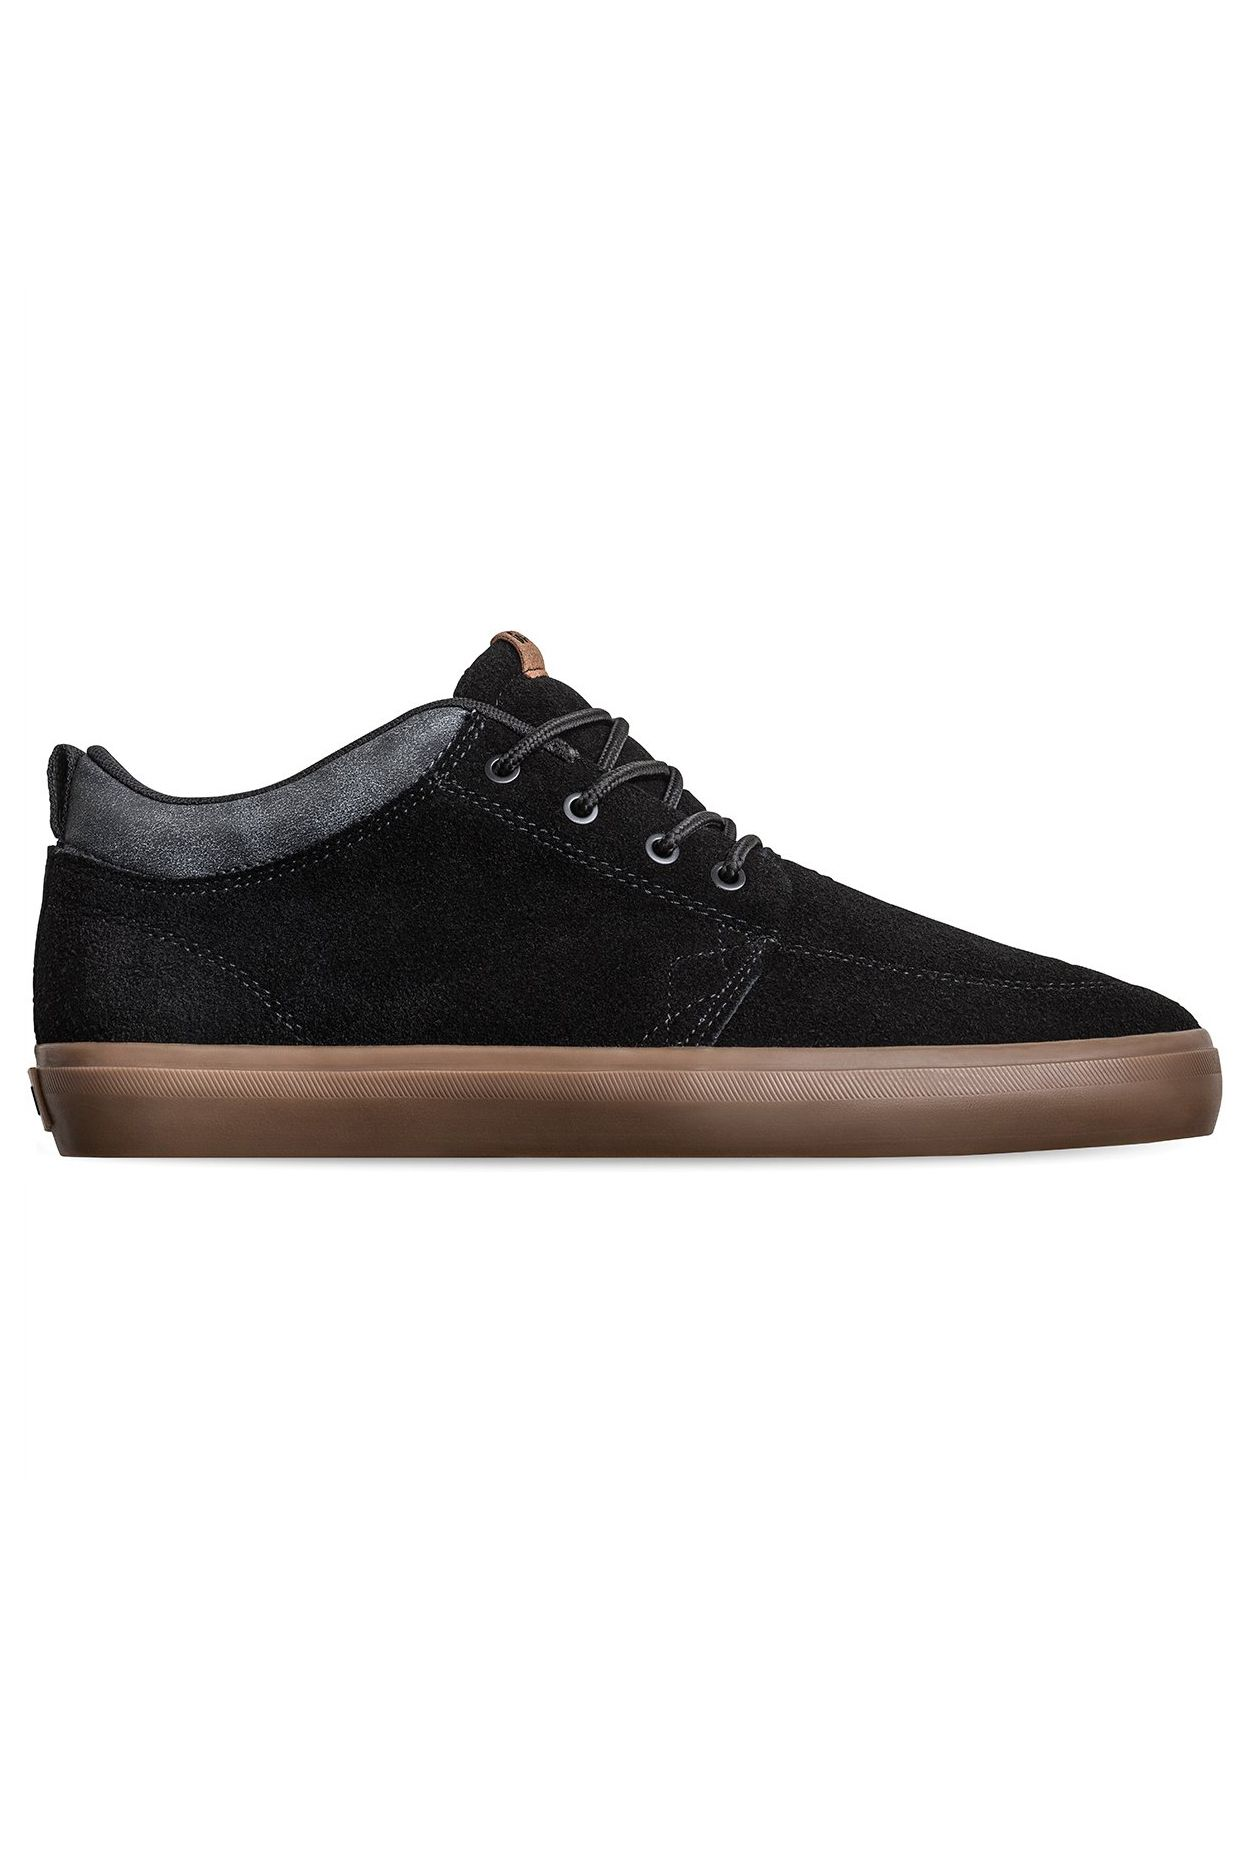 Globe Shoes GS CHUKKA Black/Grey/Tobacco